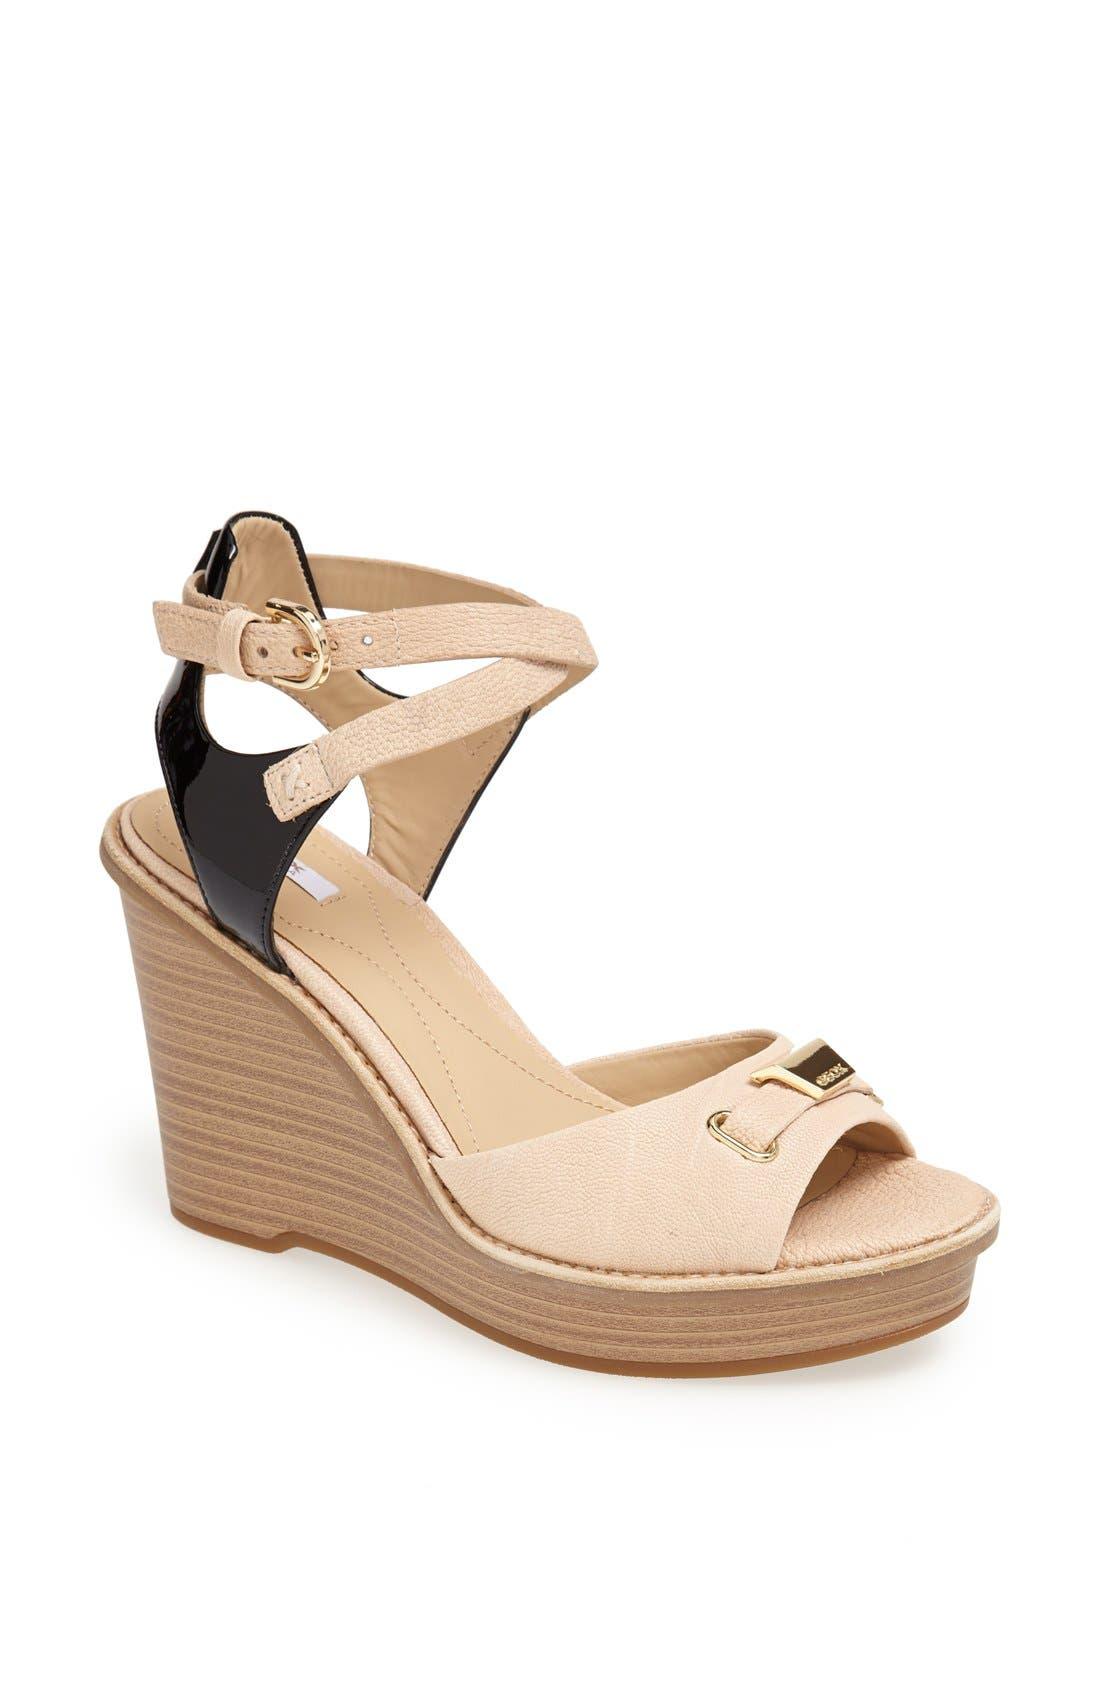 Main Image - Geox 'Maranta' Wedge Sandal